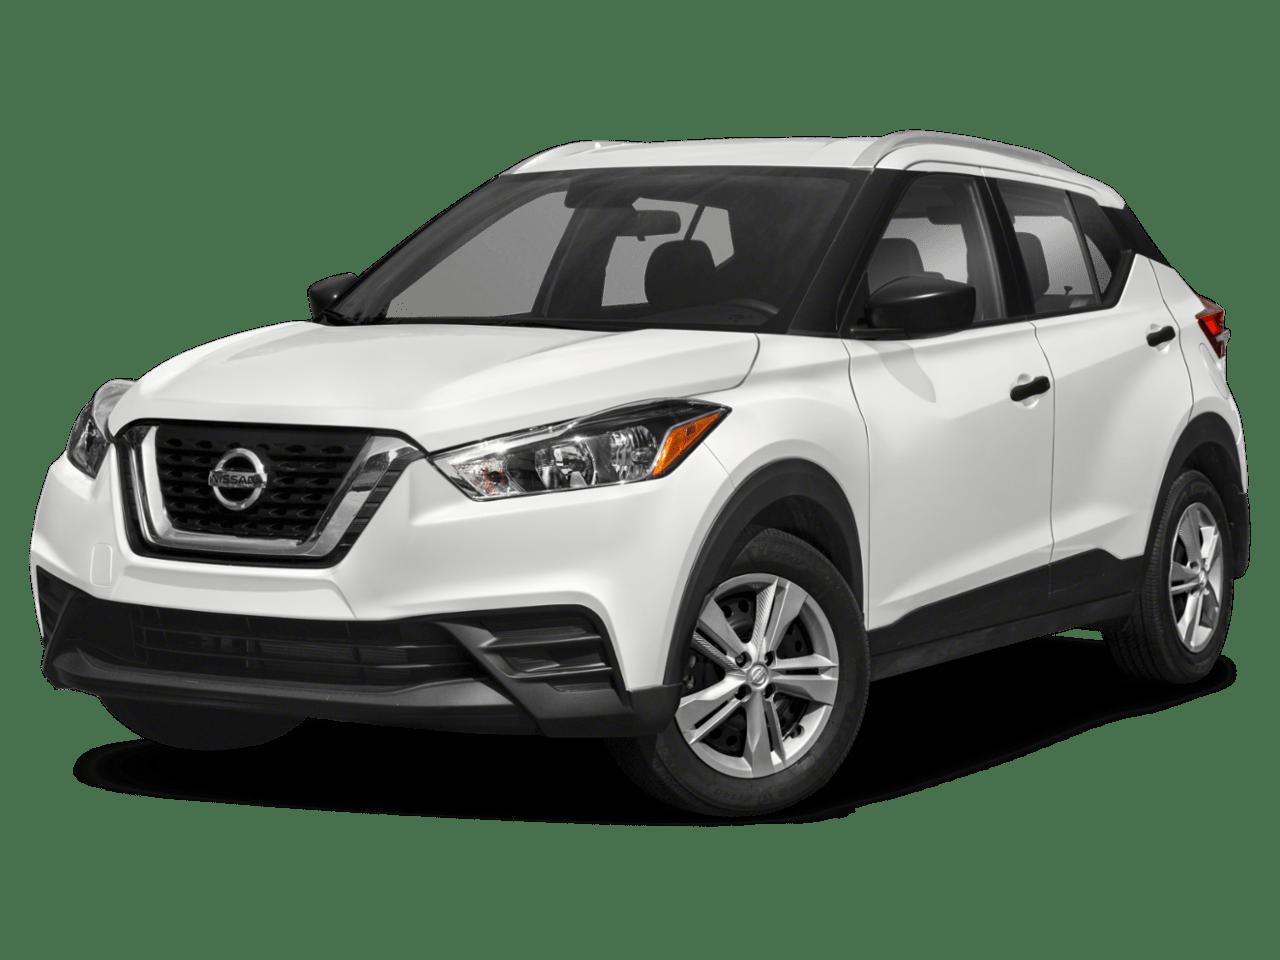 2019_Nissan_Kicks_Big